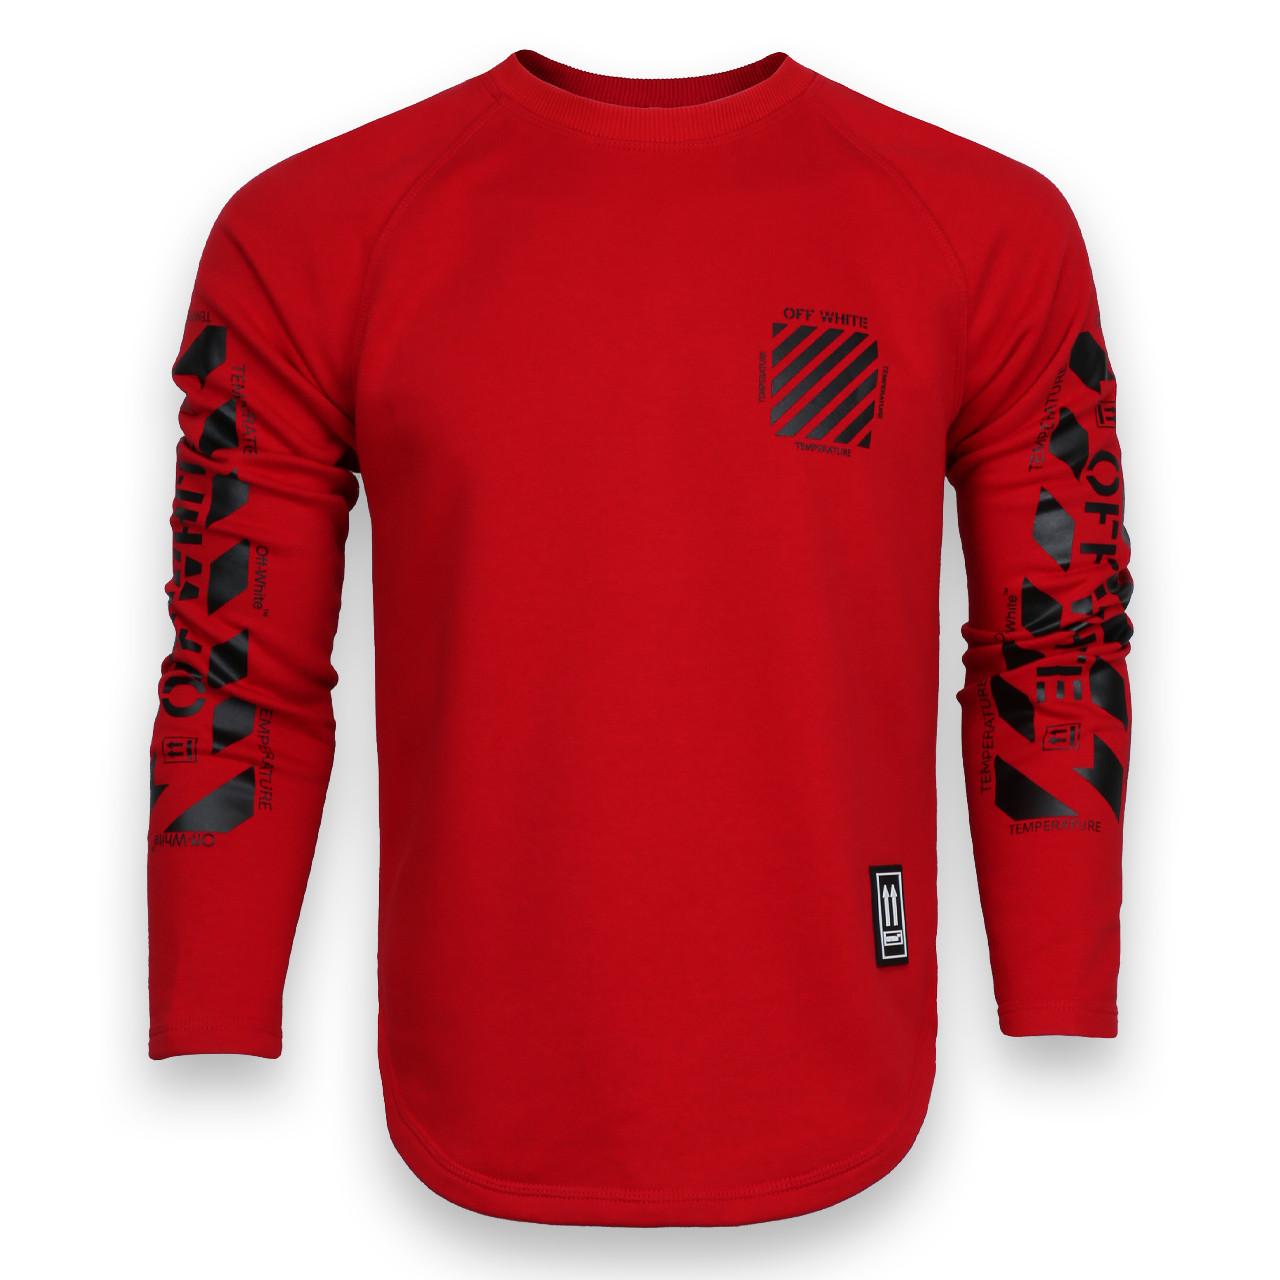 Свитшот красный OFF-WHITE №6, рис на рукавах RED L(Р) 20-518-201-003